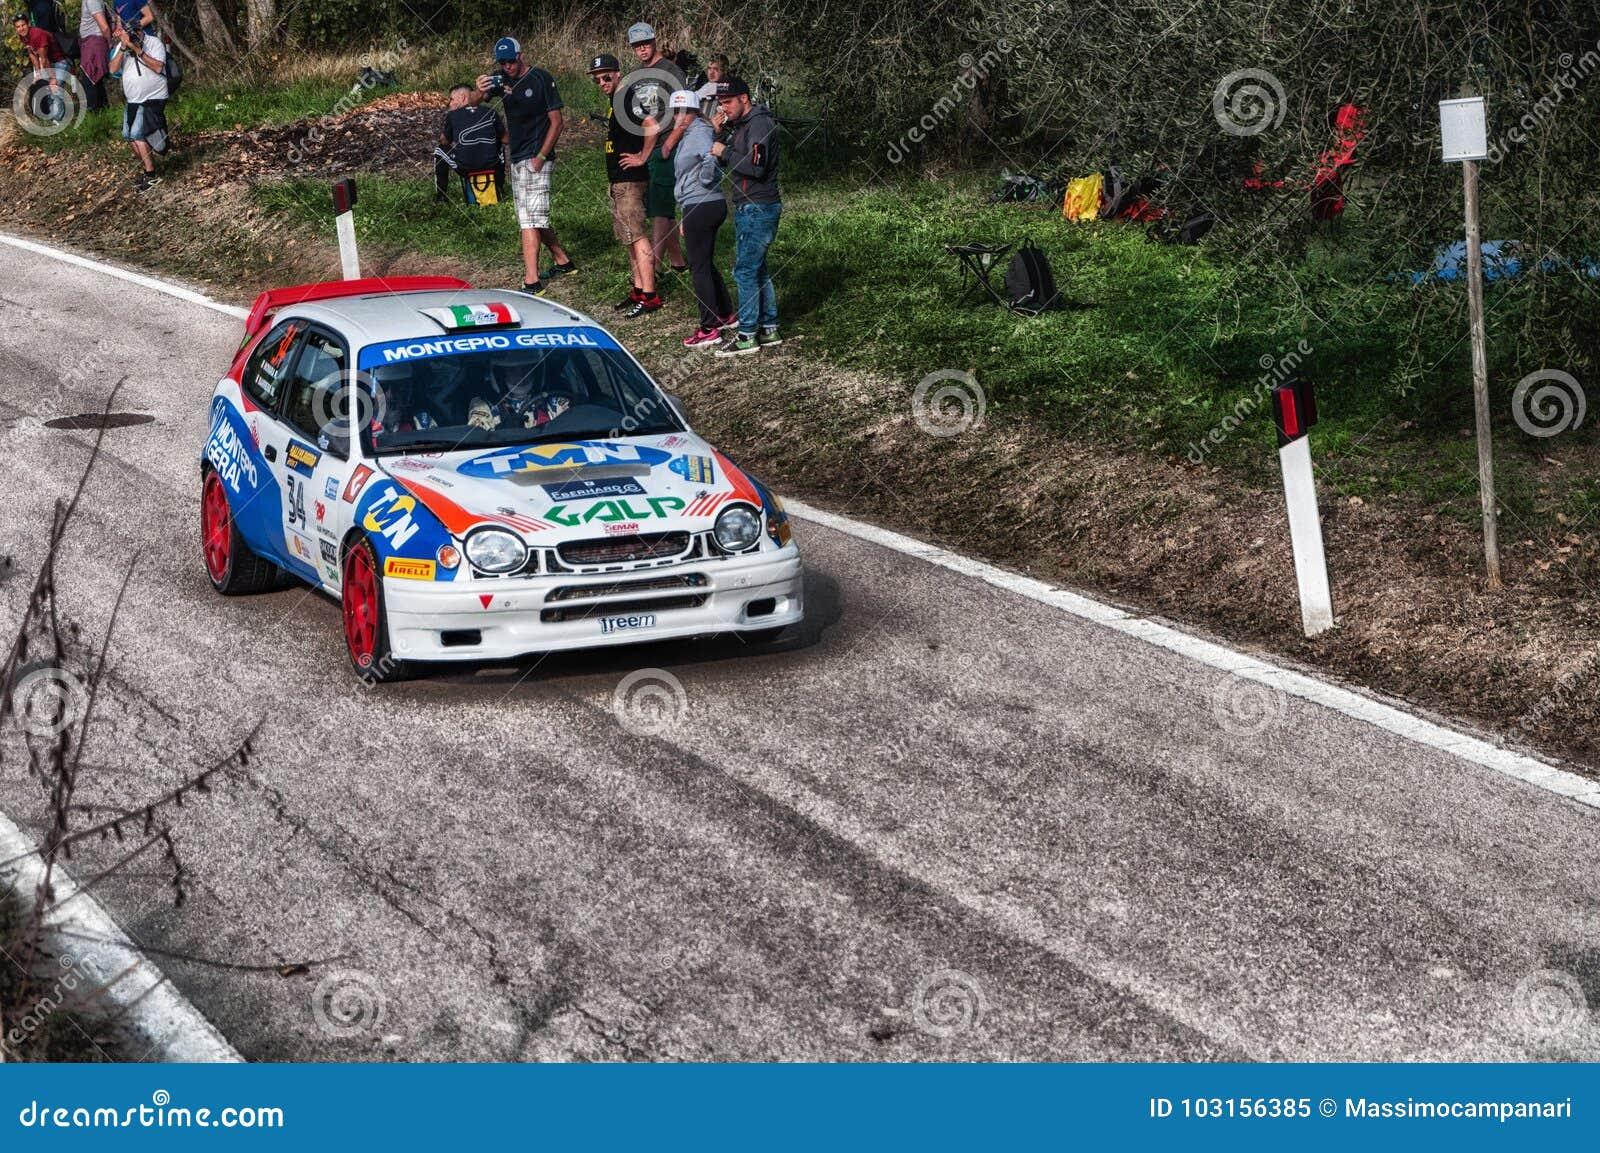 TOYOTA COROLLA WRC 1997 in oude raceauto verzamelt de LEGENDE 2017